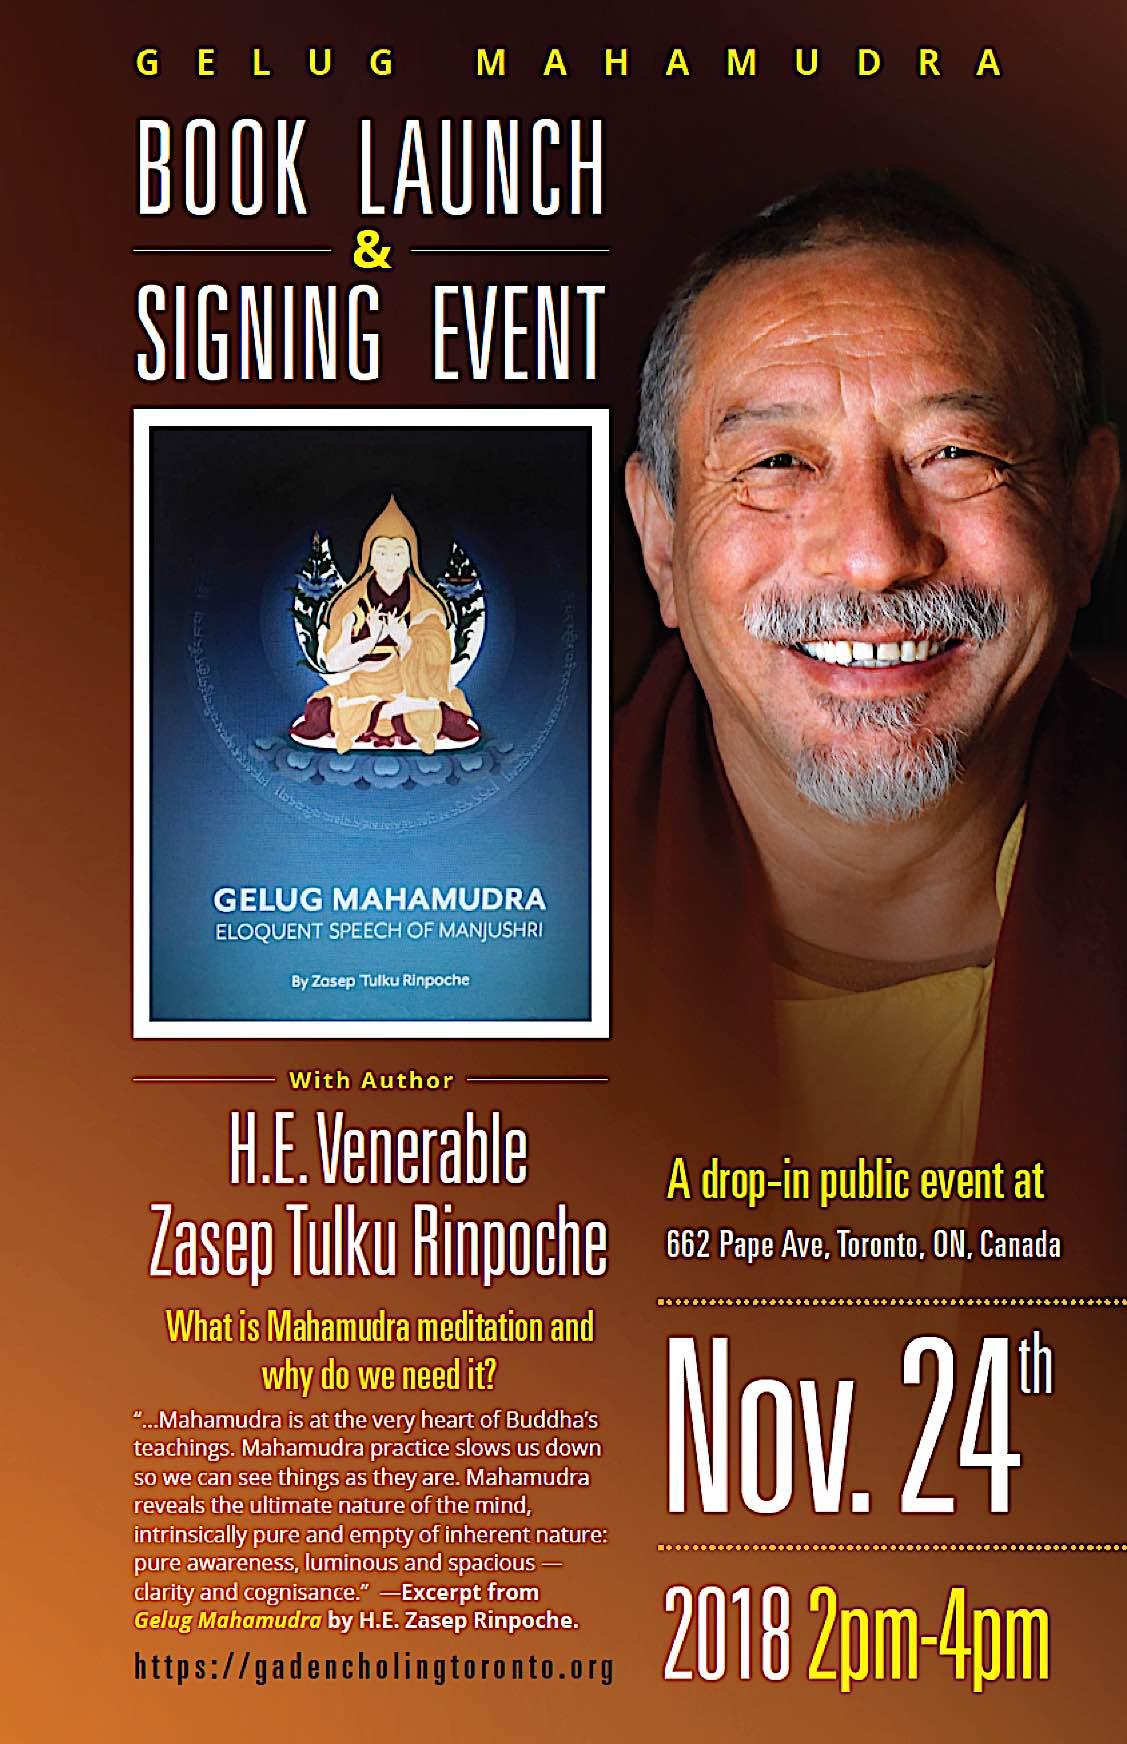 Buddha Weekly Gelug Mahamudra book signing and launch H E Zasep Rinpoche Gaden Choling Nov 24 Buddhism